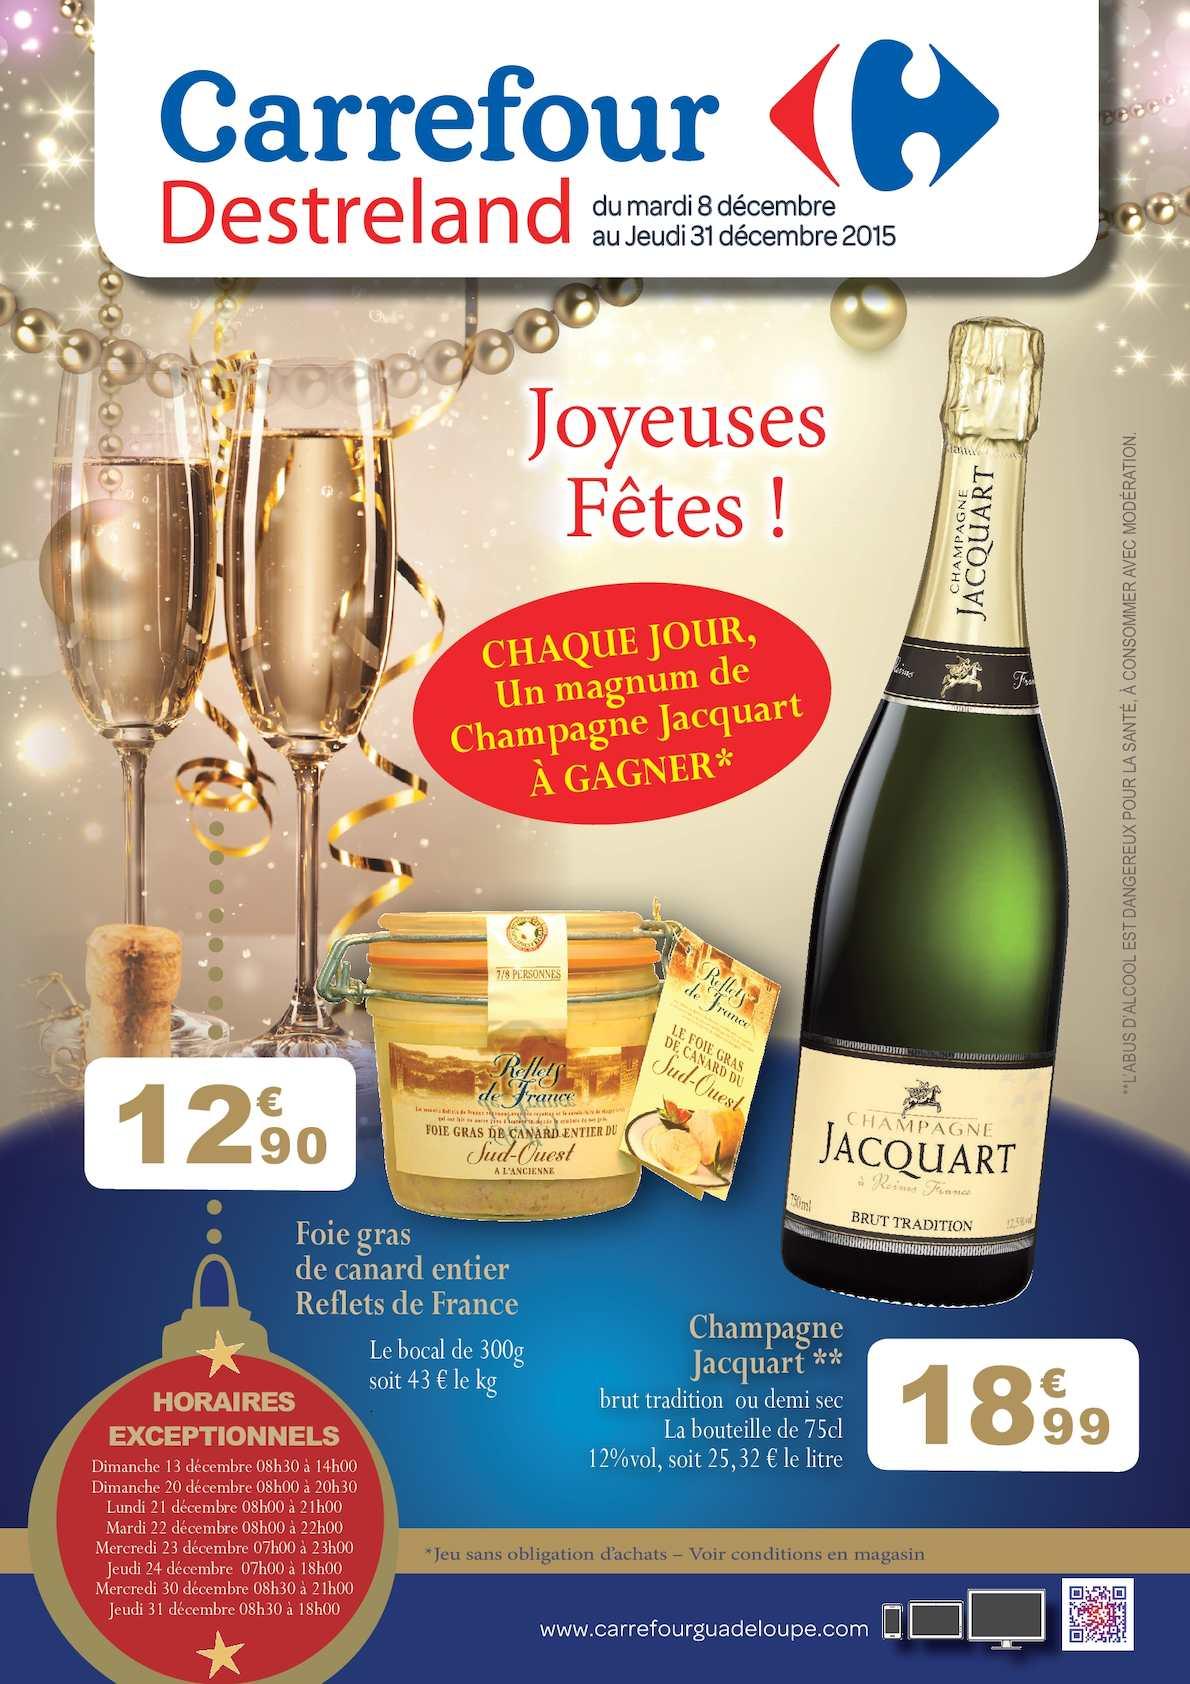 Calam o carrefour catalogue festifs 2015 - Joyeuses fetes magasin ...